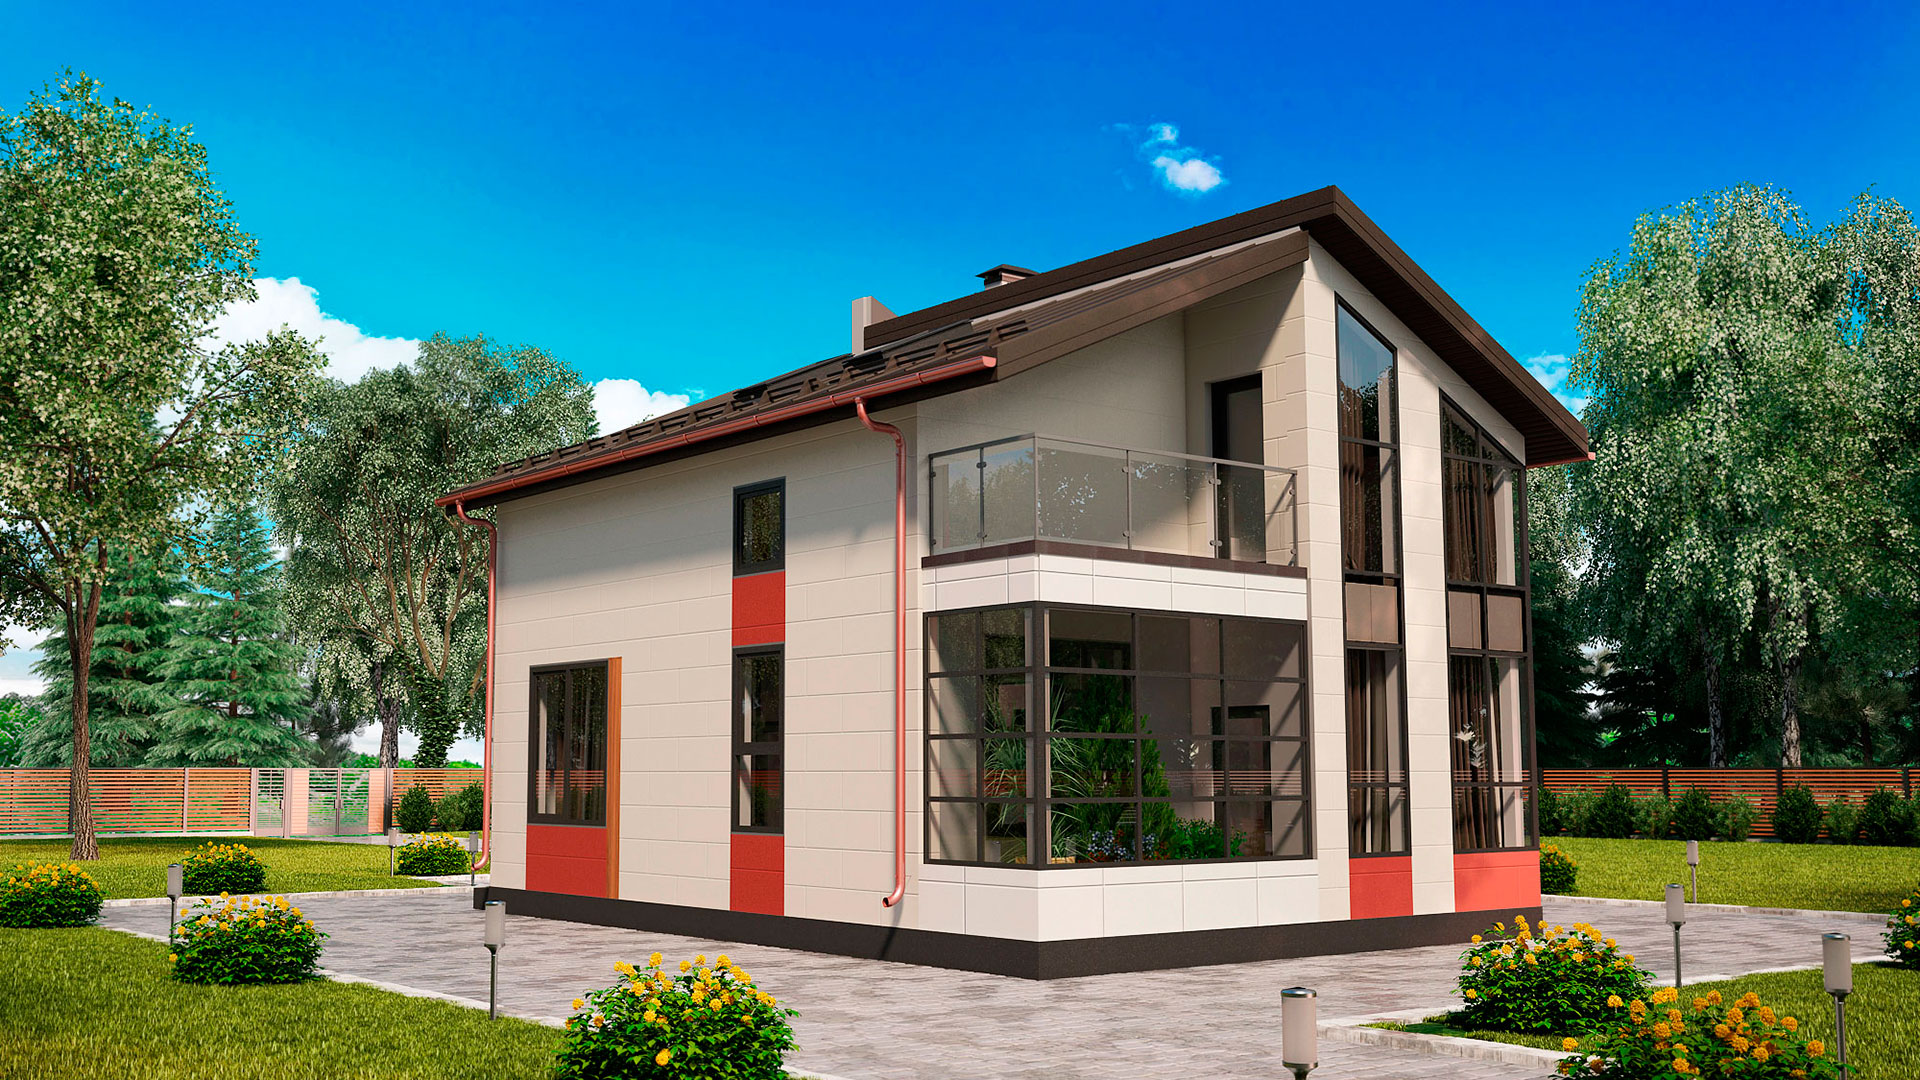 Задний фасад дома 7 на 10 двухэтажного, проект БЭНПАН МС-112.